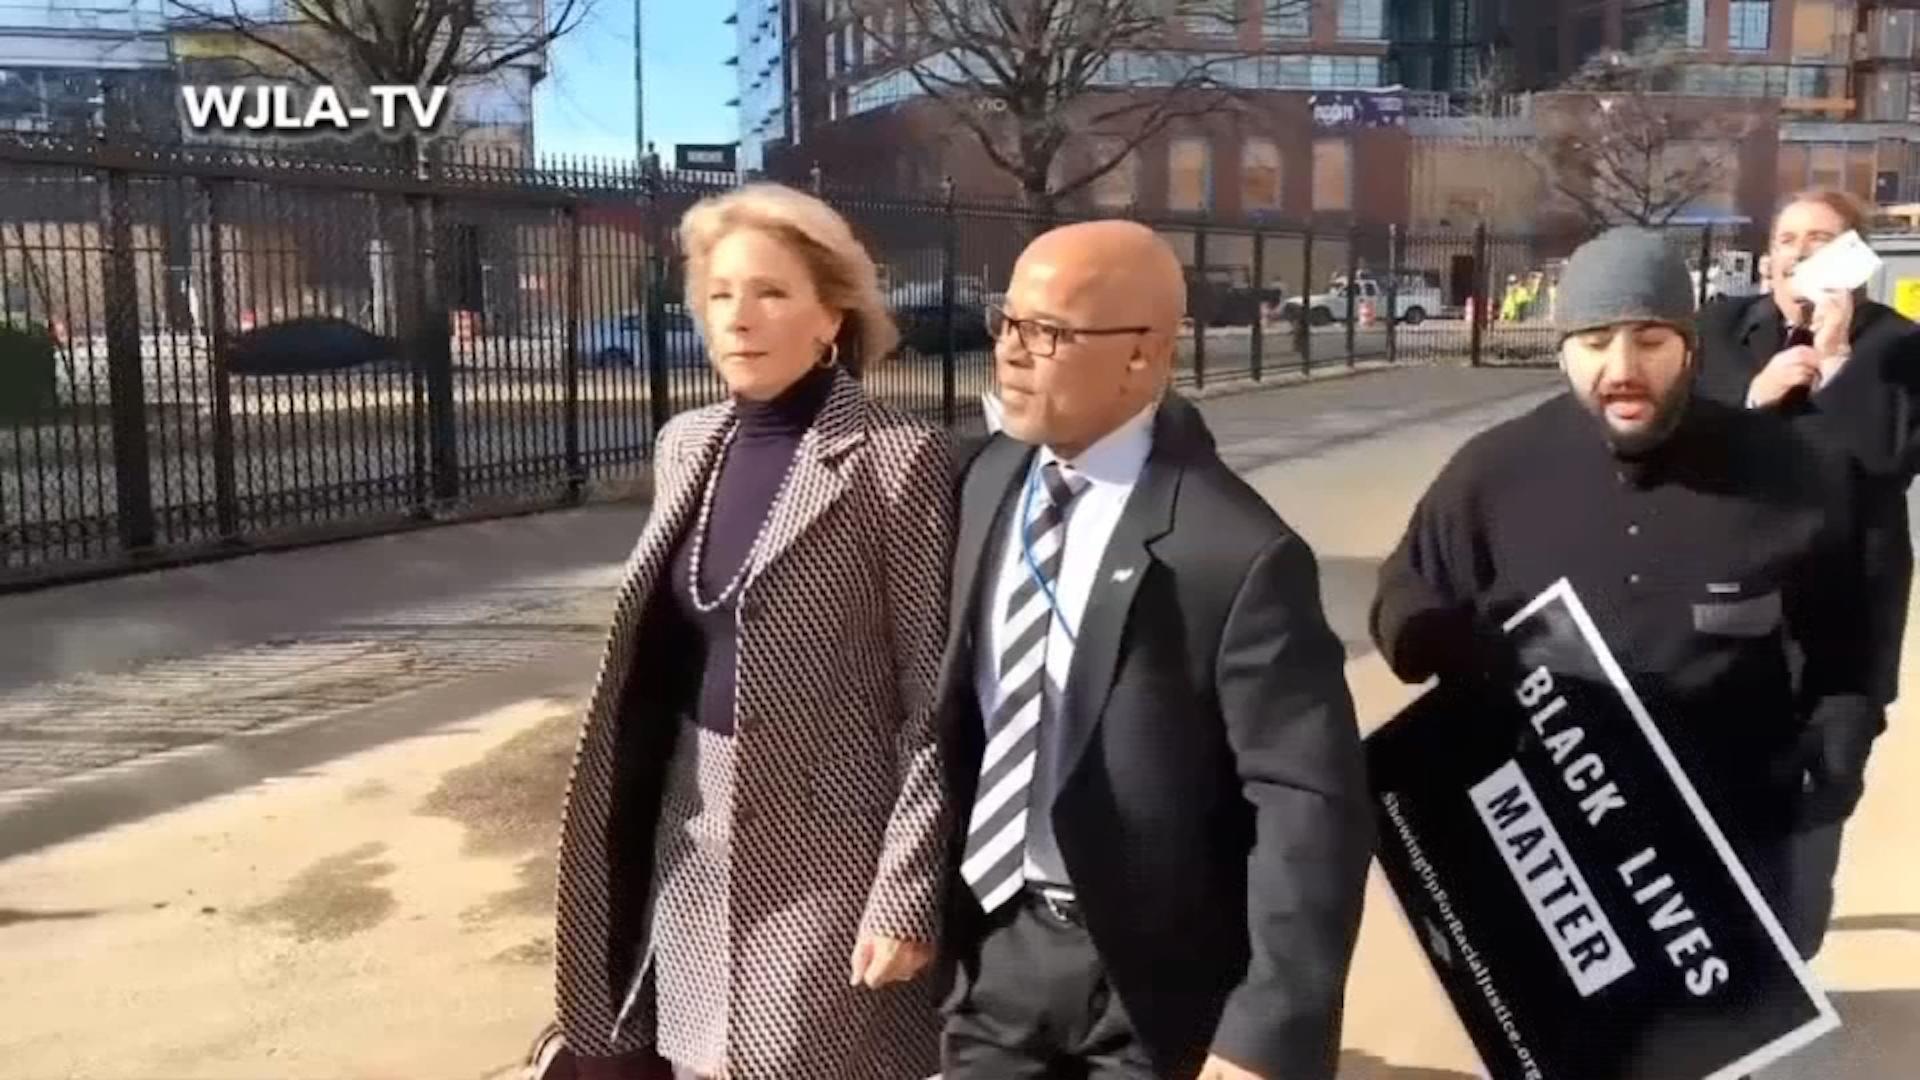 Protesters briefly block Education Secretary Betsy DeVos's visit to a D.C. school